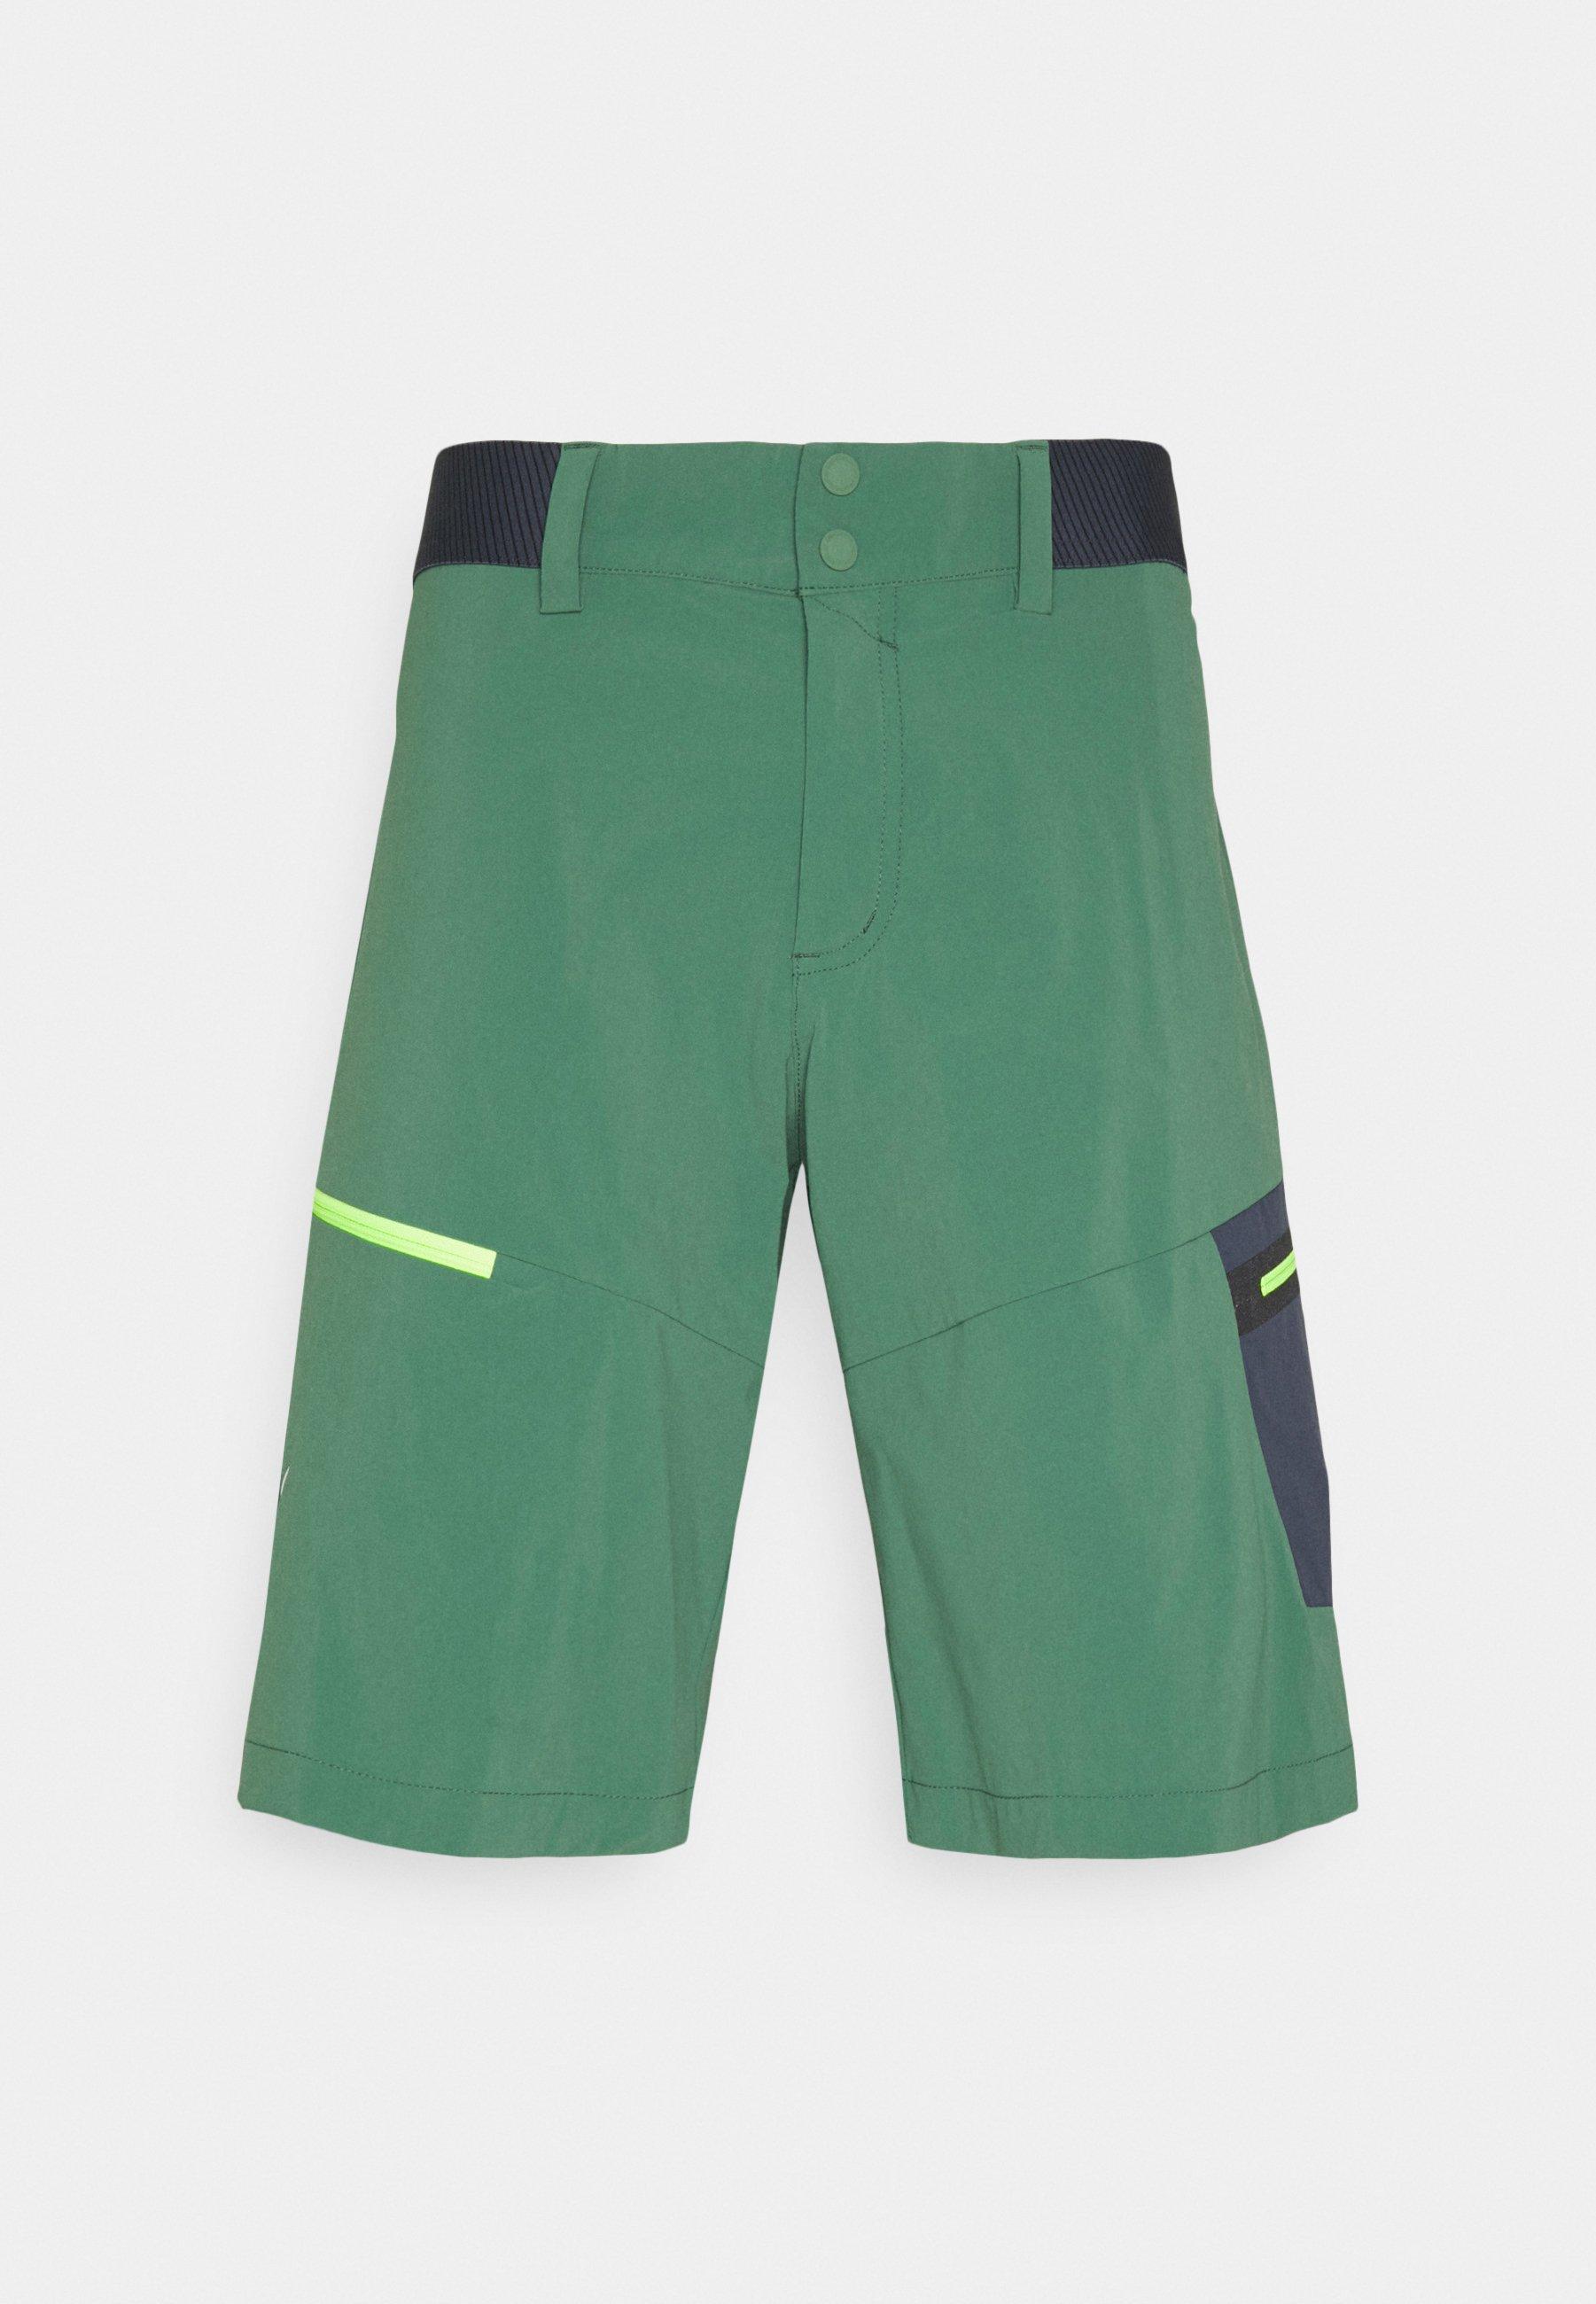 Homme PEDROC CARGO SHORTS - Short